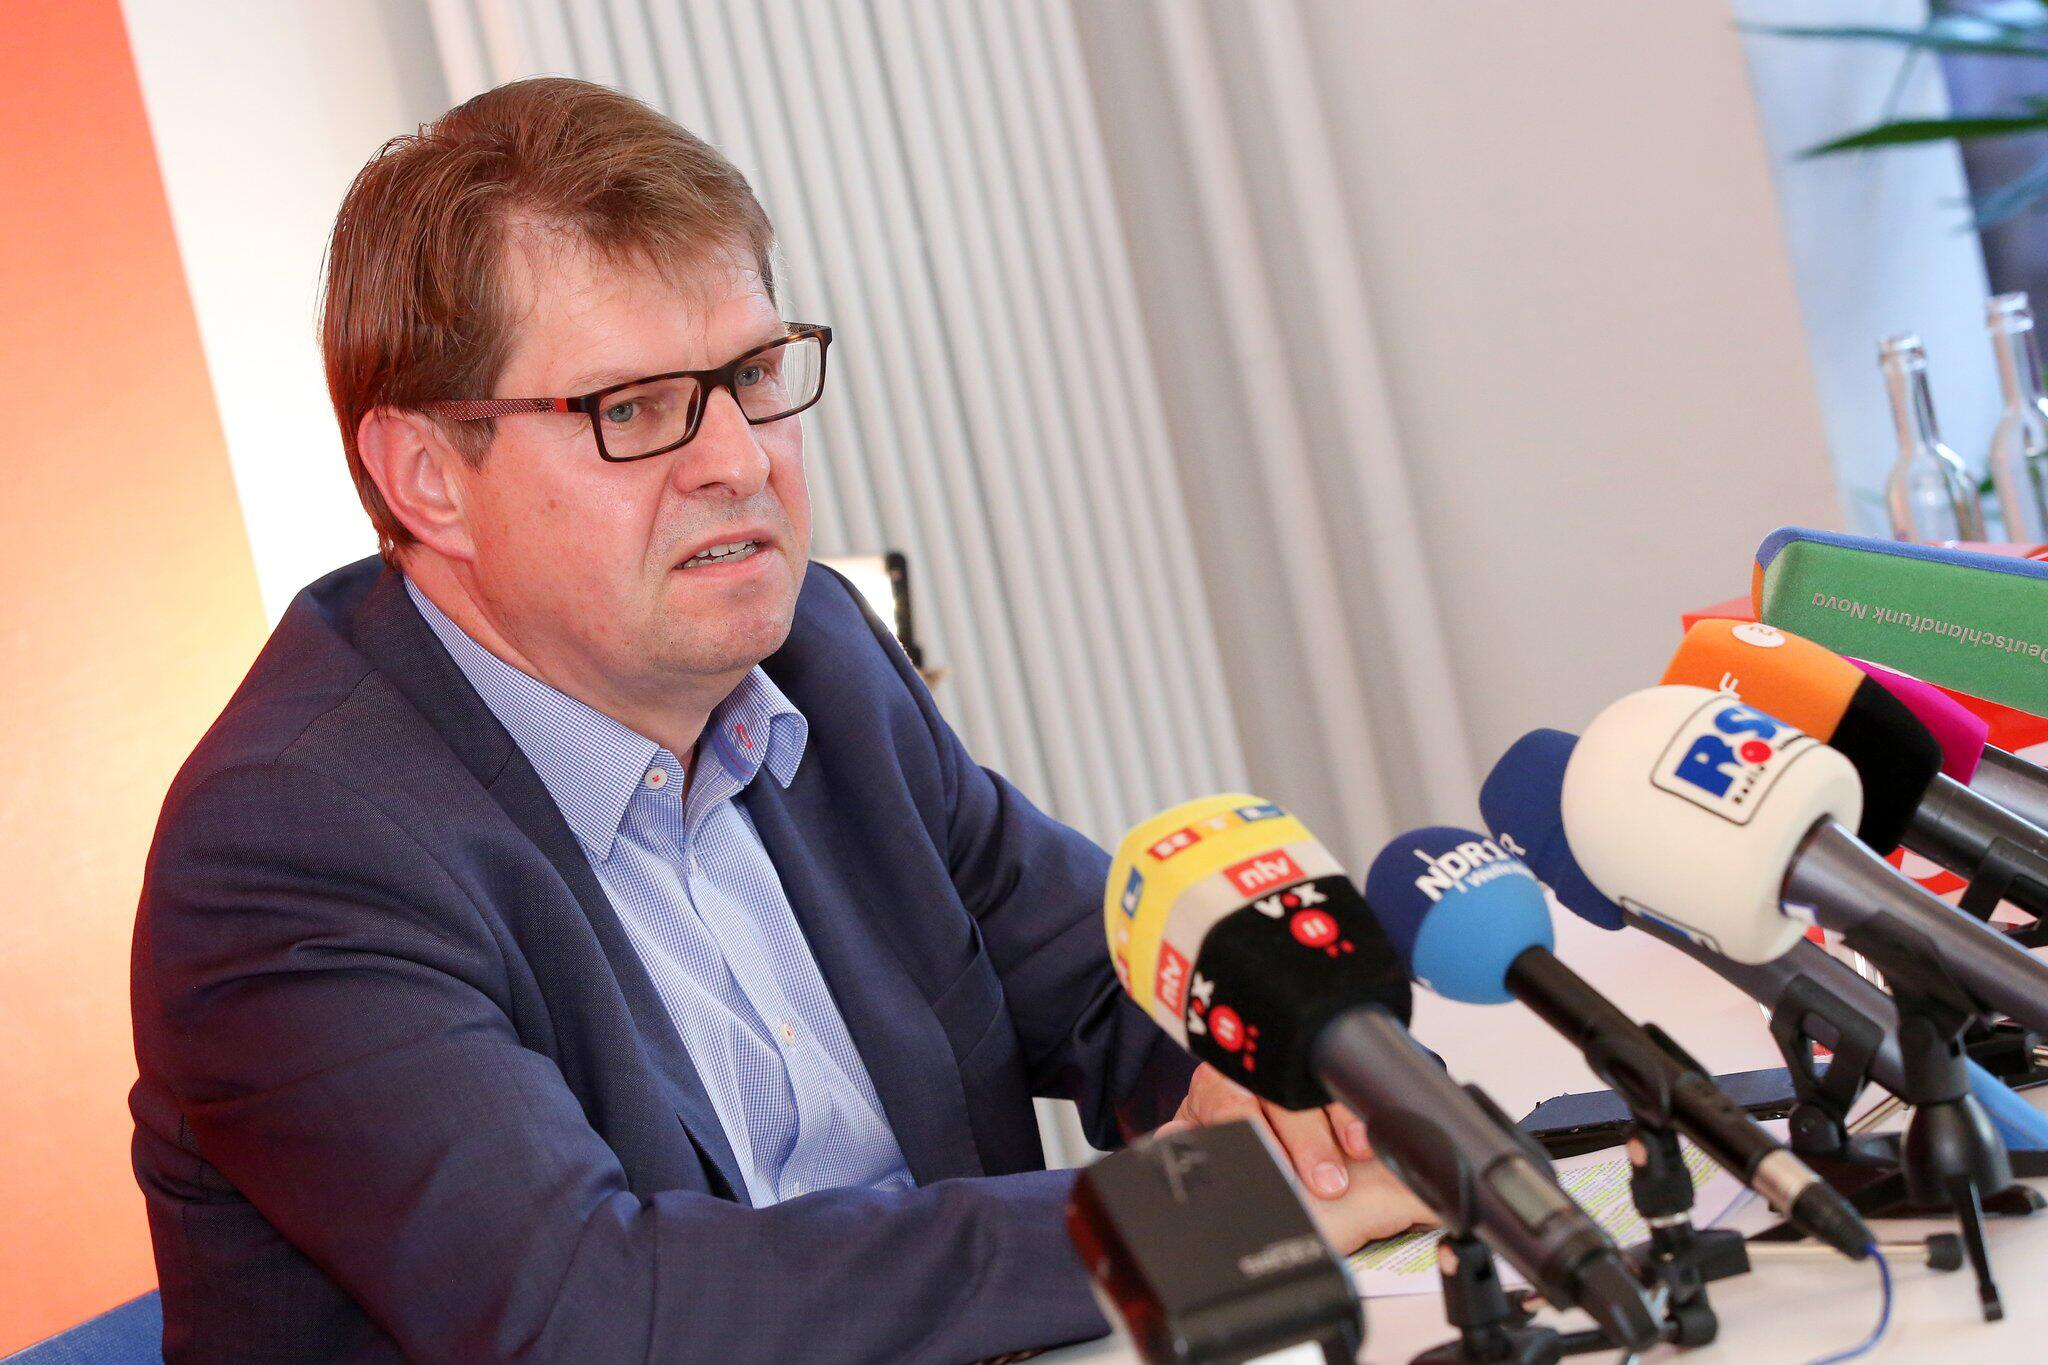 Bild zu Stegner to step down as head of the North SPD in 2019